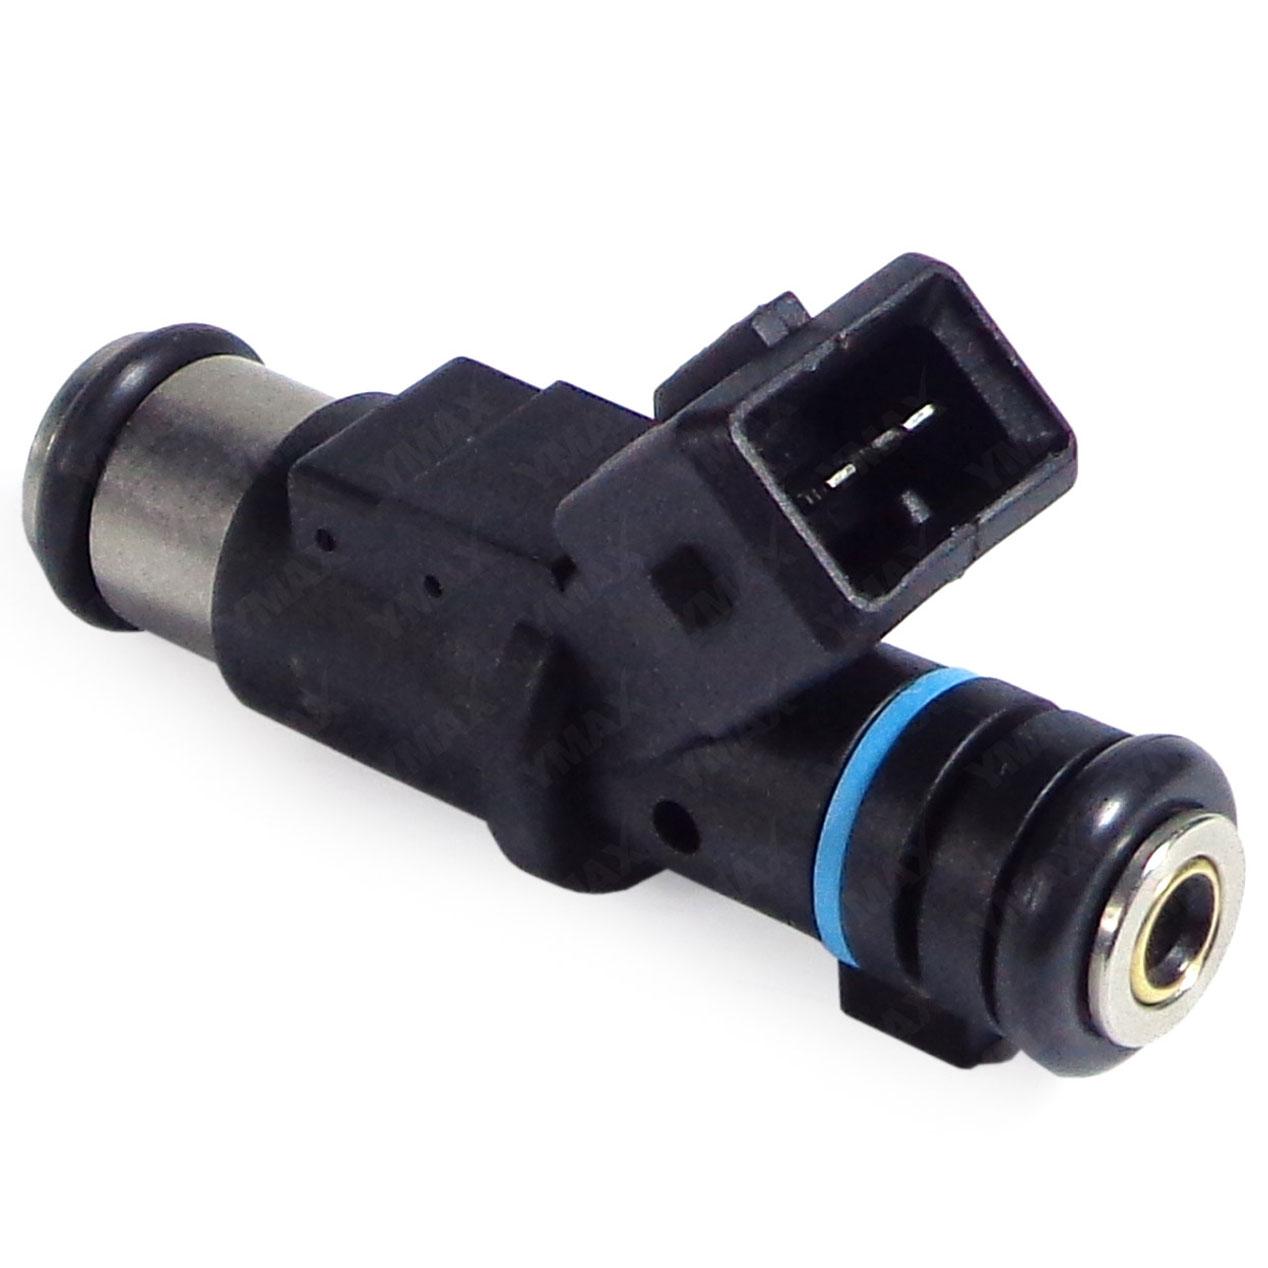 Bico Injetor de Combustível C3 PEUGEOT 206 - Motor 1.4 08V -